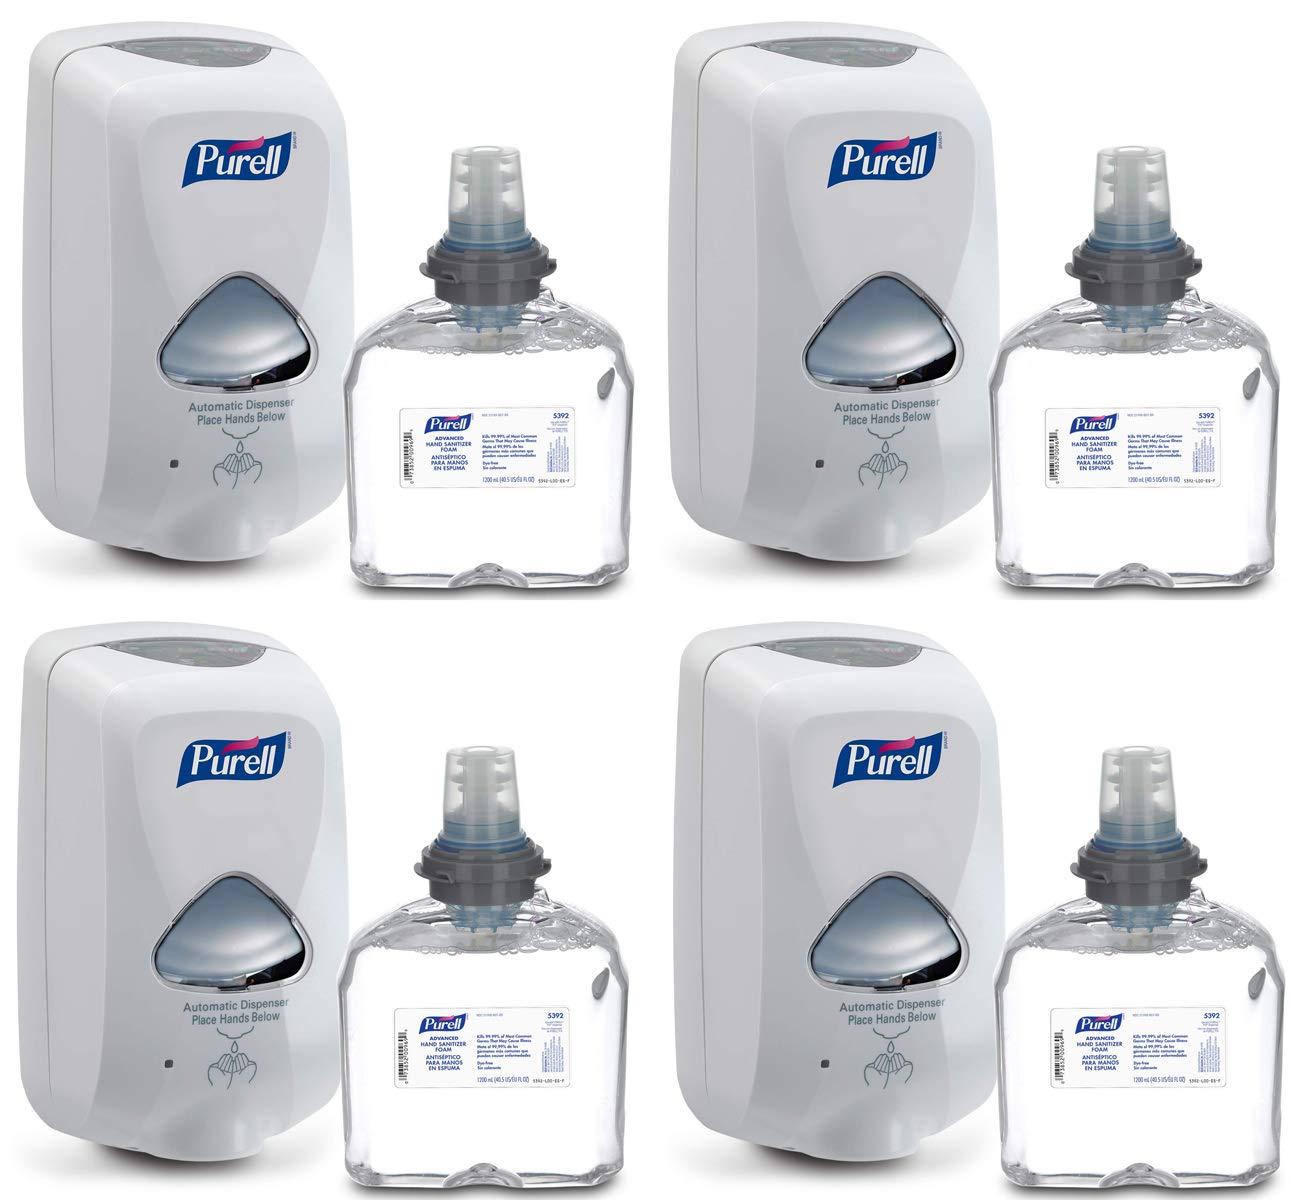 Purell WTBUK Advanced Hand Sanitizer Foam TFX Starter Kit, 4 Sets (Dispenser + Foam Refill)